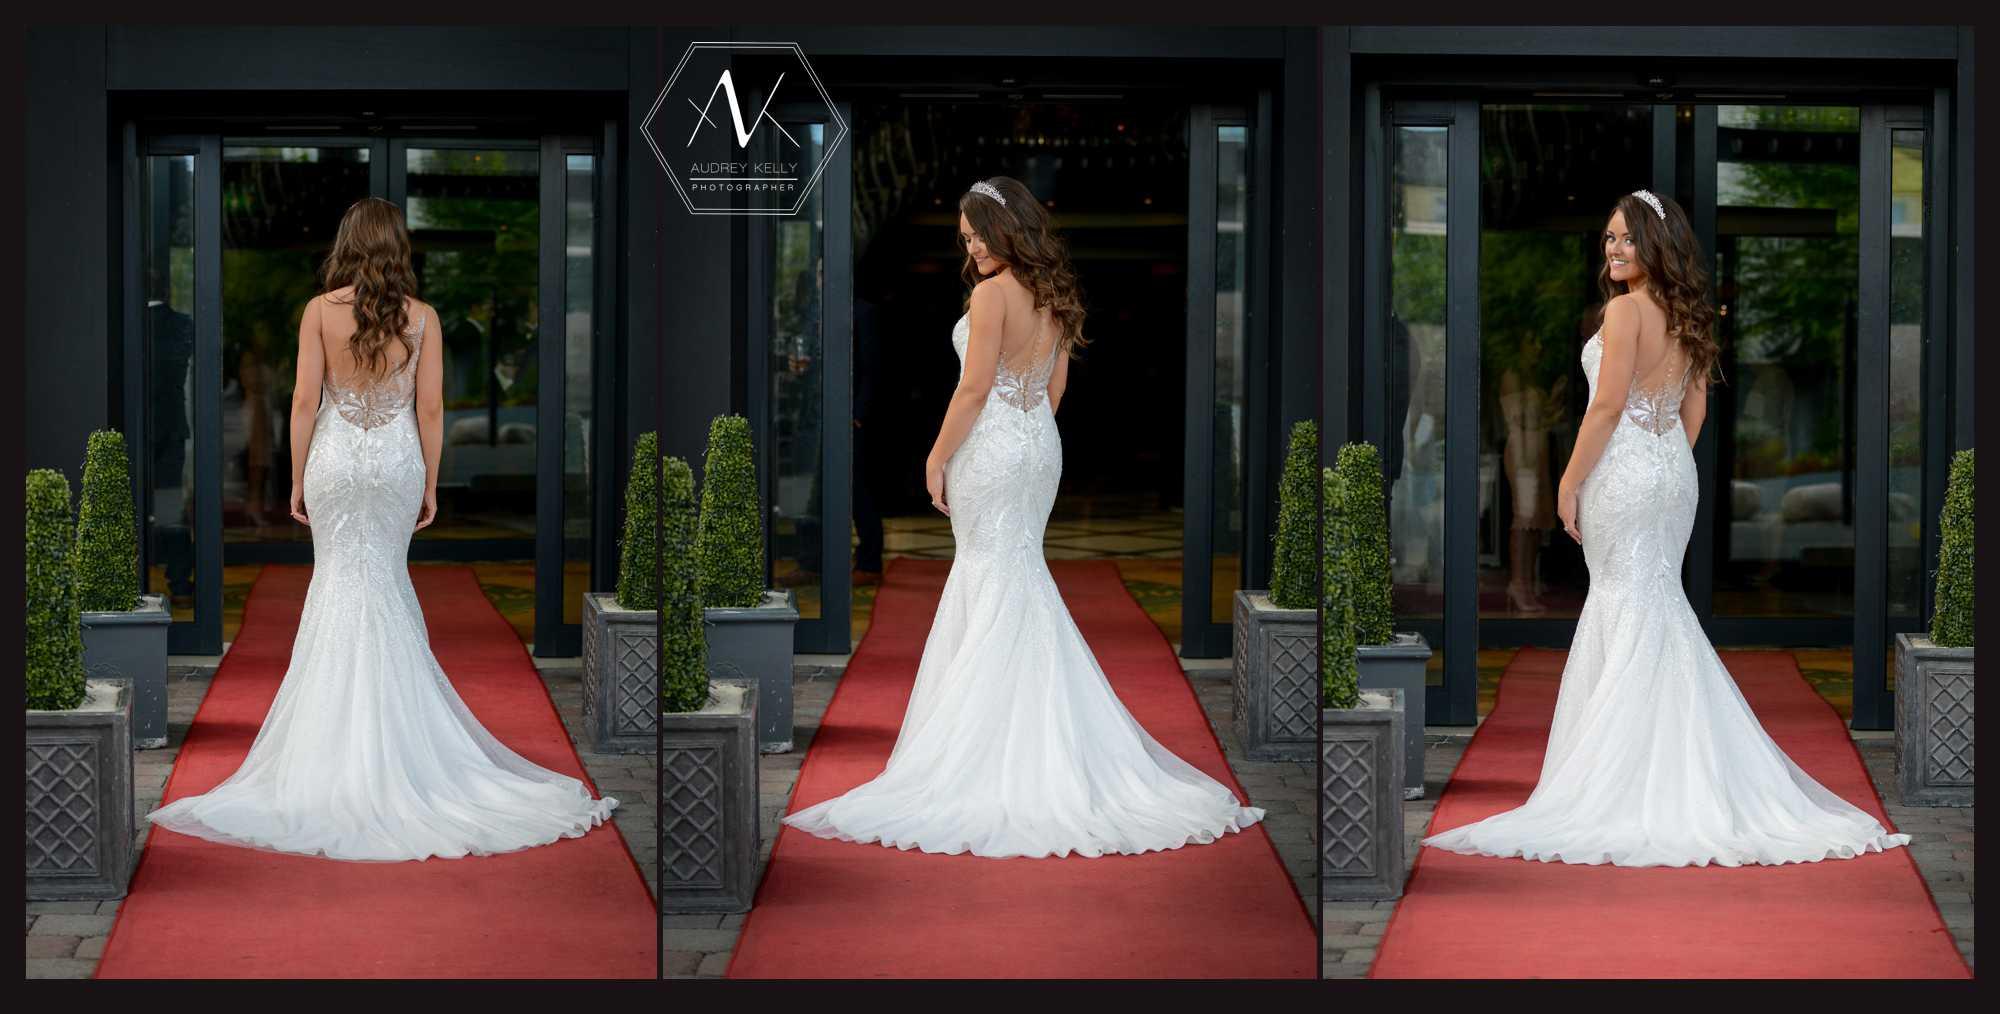 Capturing more of that stunning cararose bridal designer dress and the incredible detail.